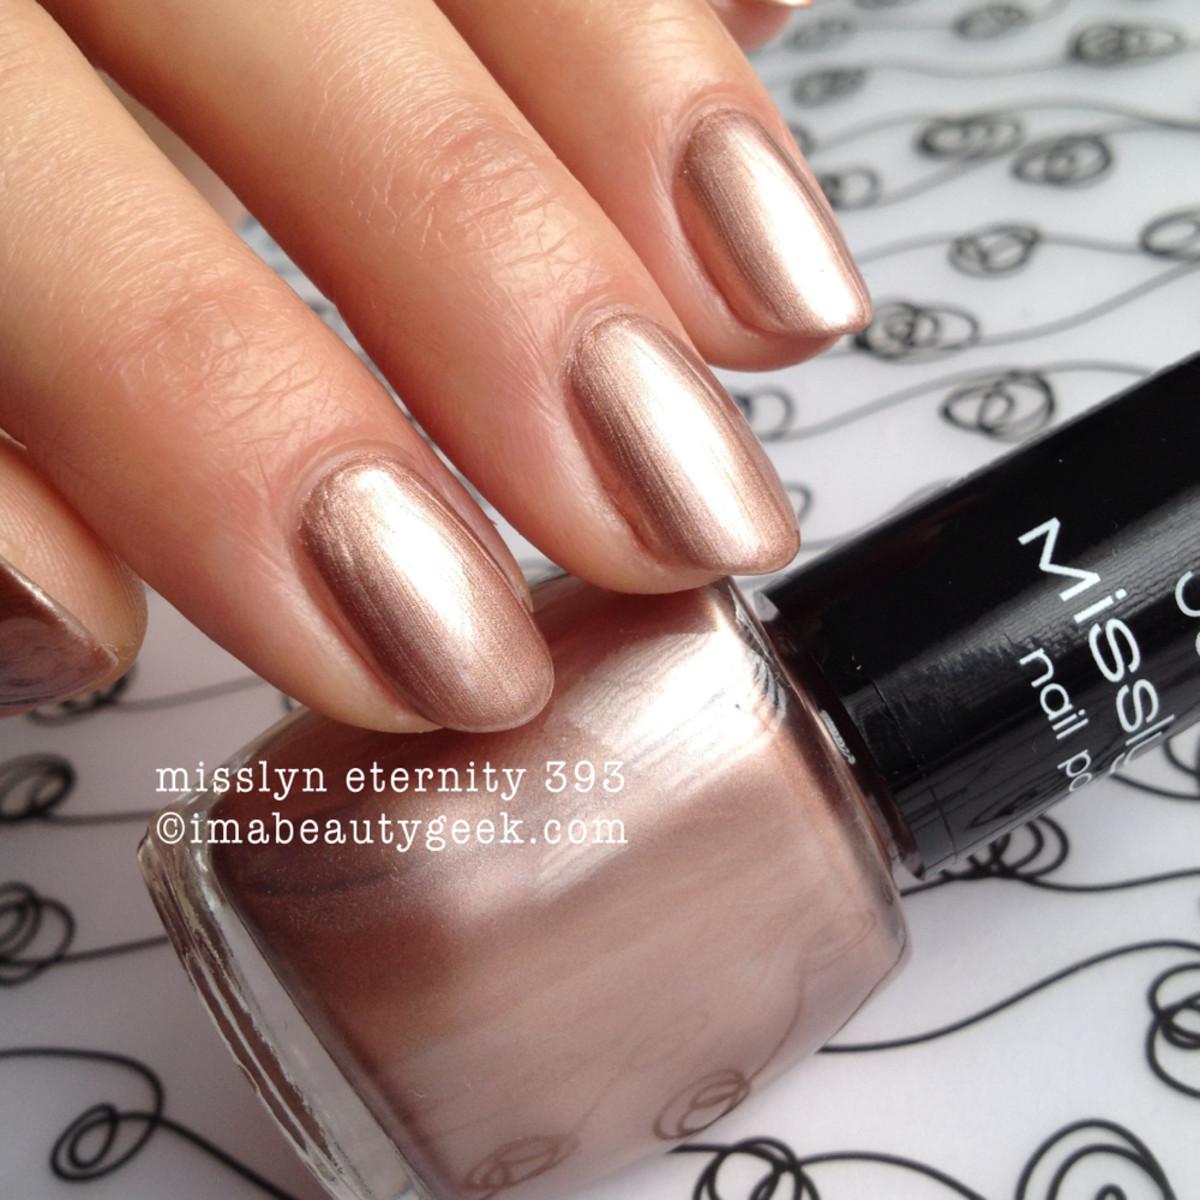 Misslyn Eternity 393 nail polish